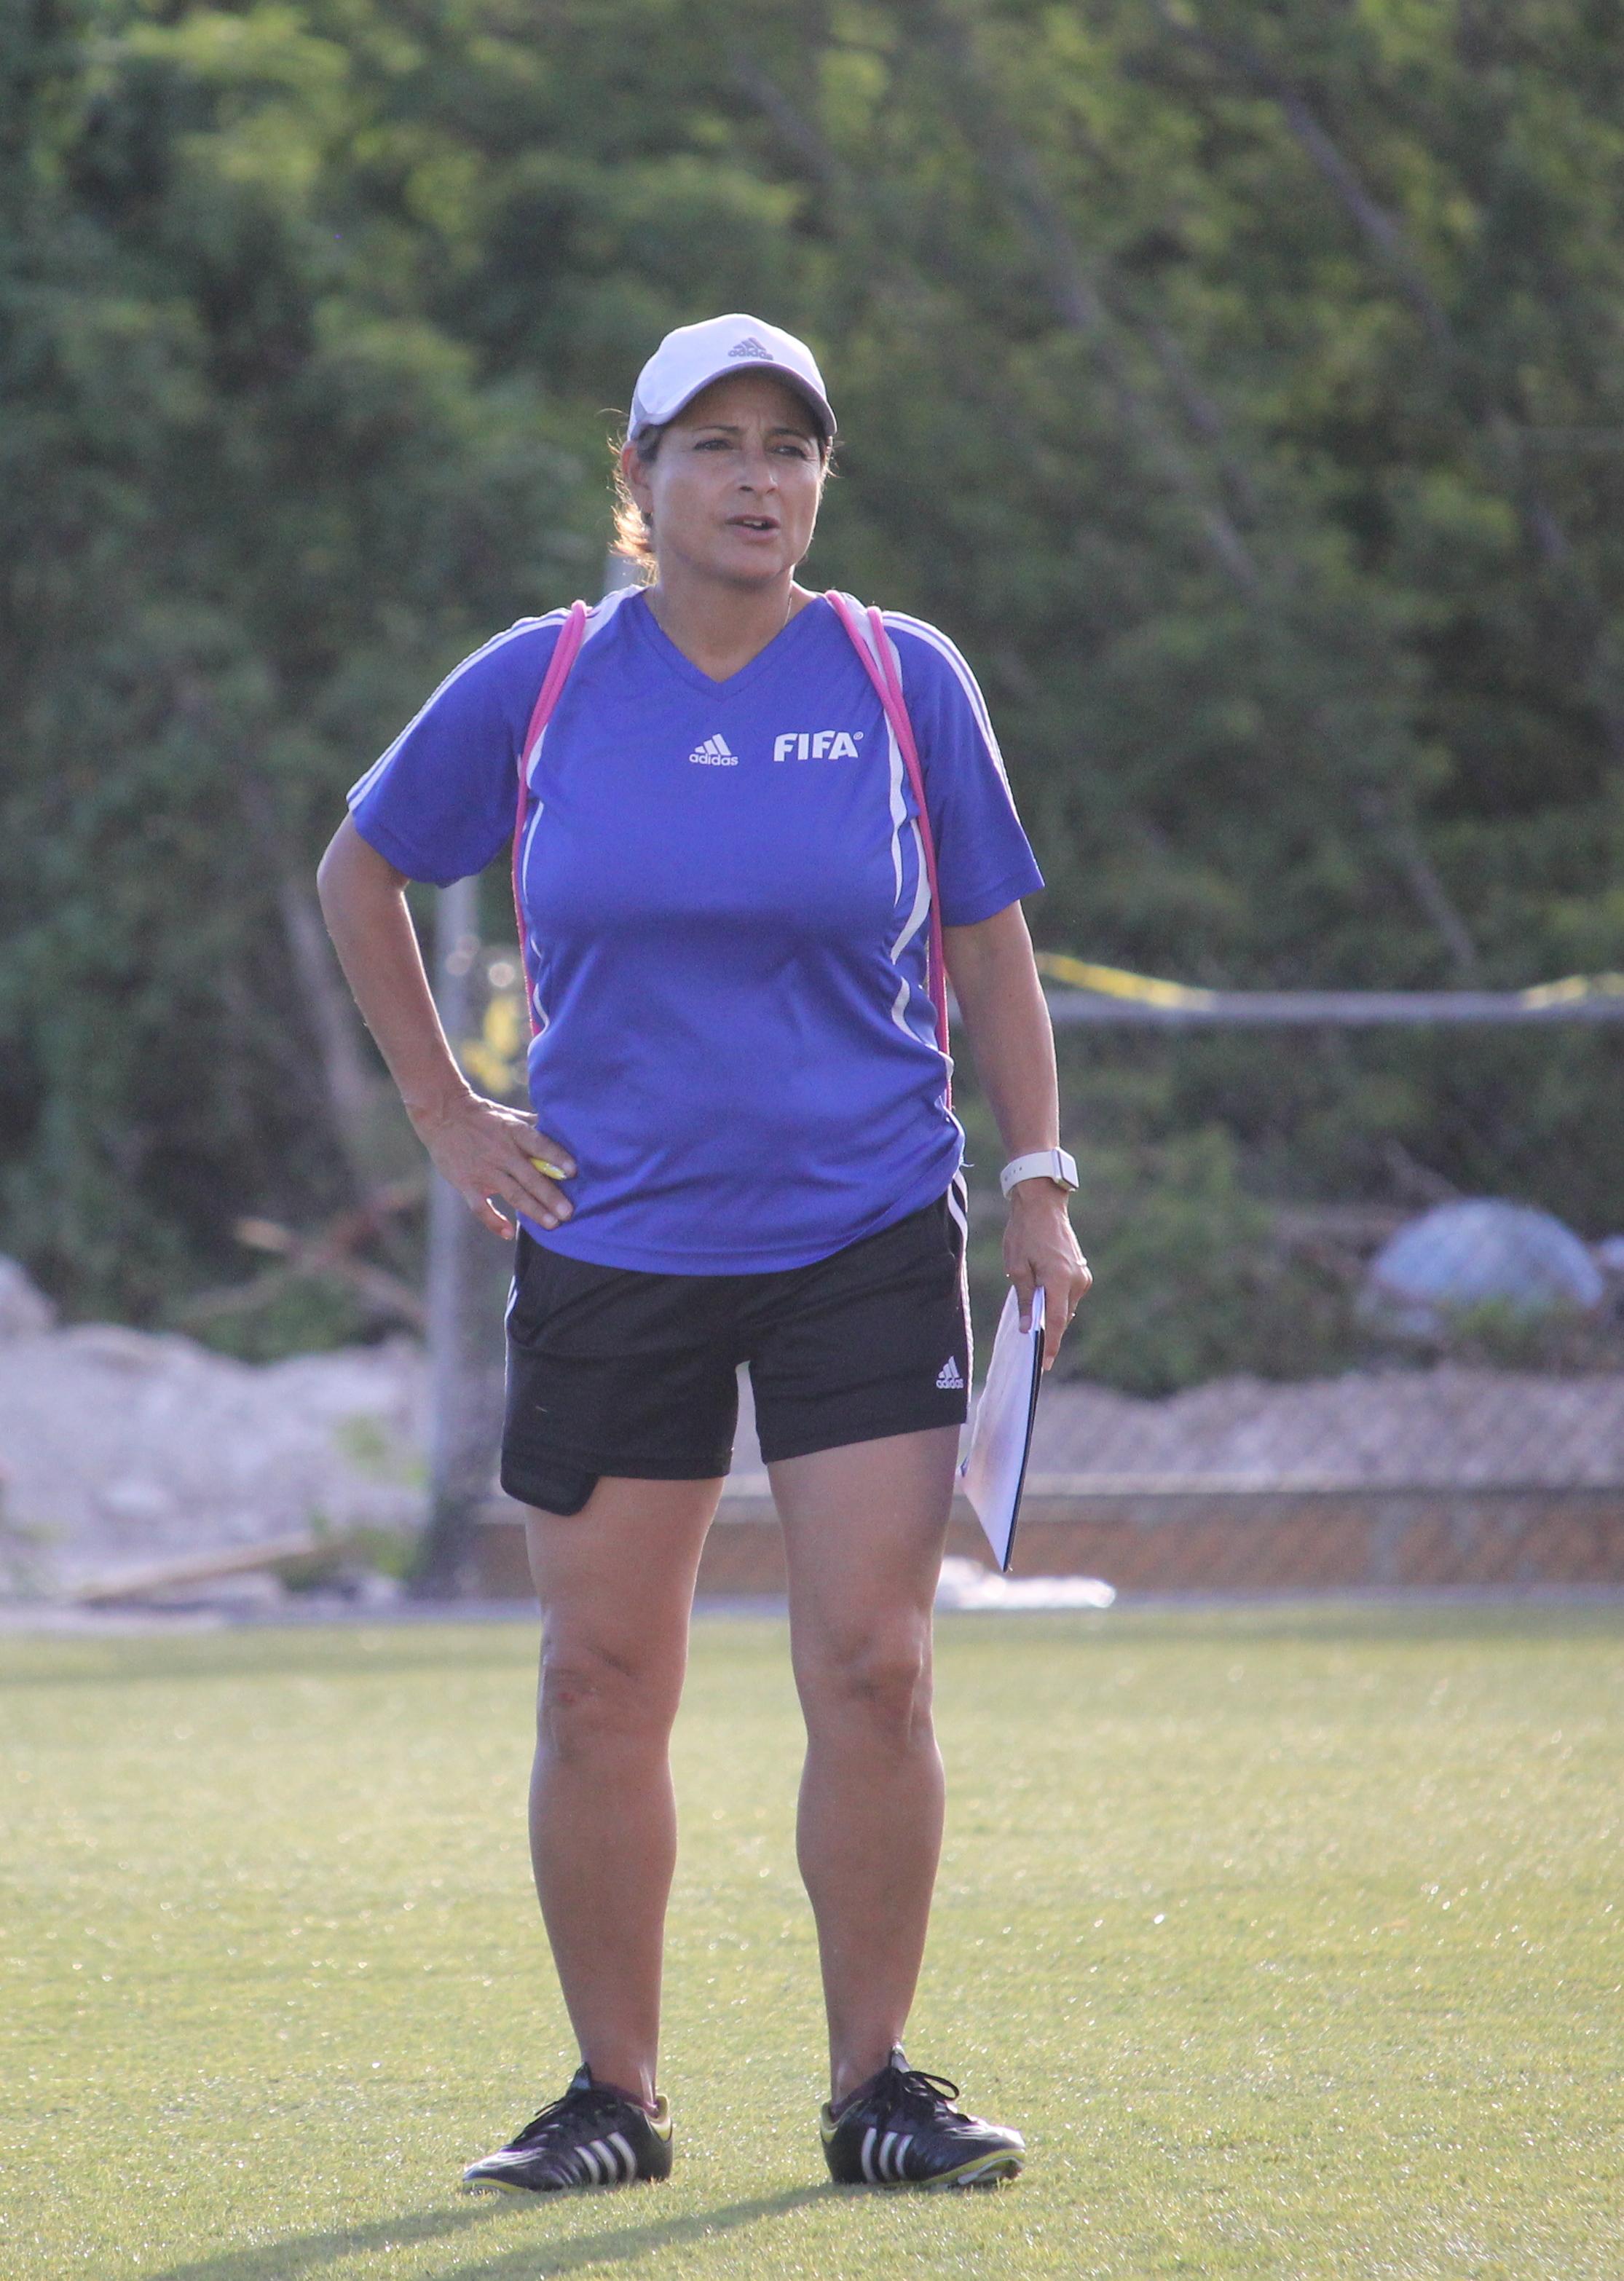 FIFA Instructor, Andrea Rodebaugh